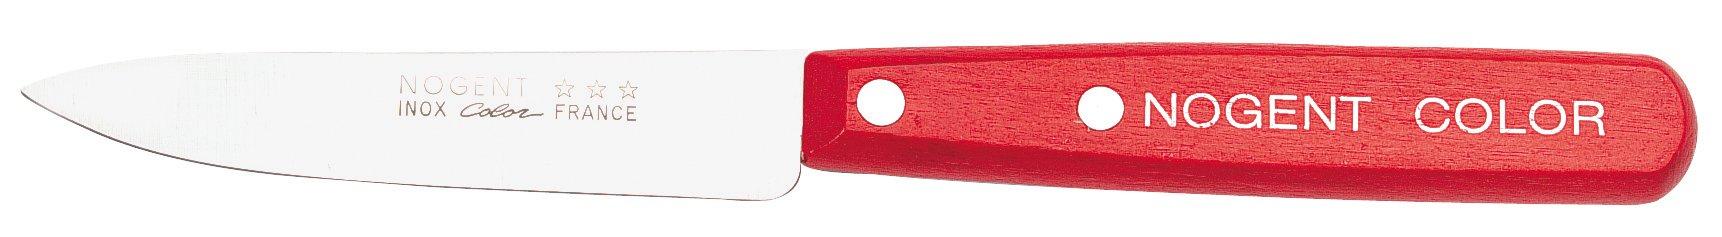 Nogent Color 3-1/2-Inch Sharpened Paring Knife, Cherry Wood Handle